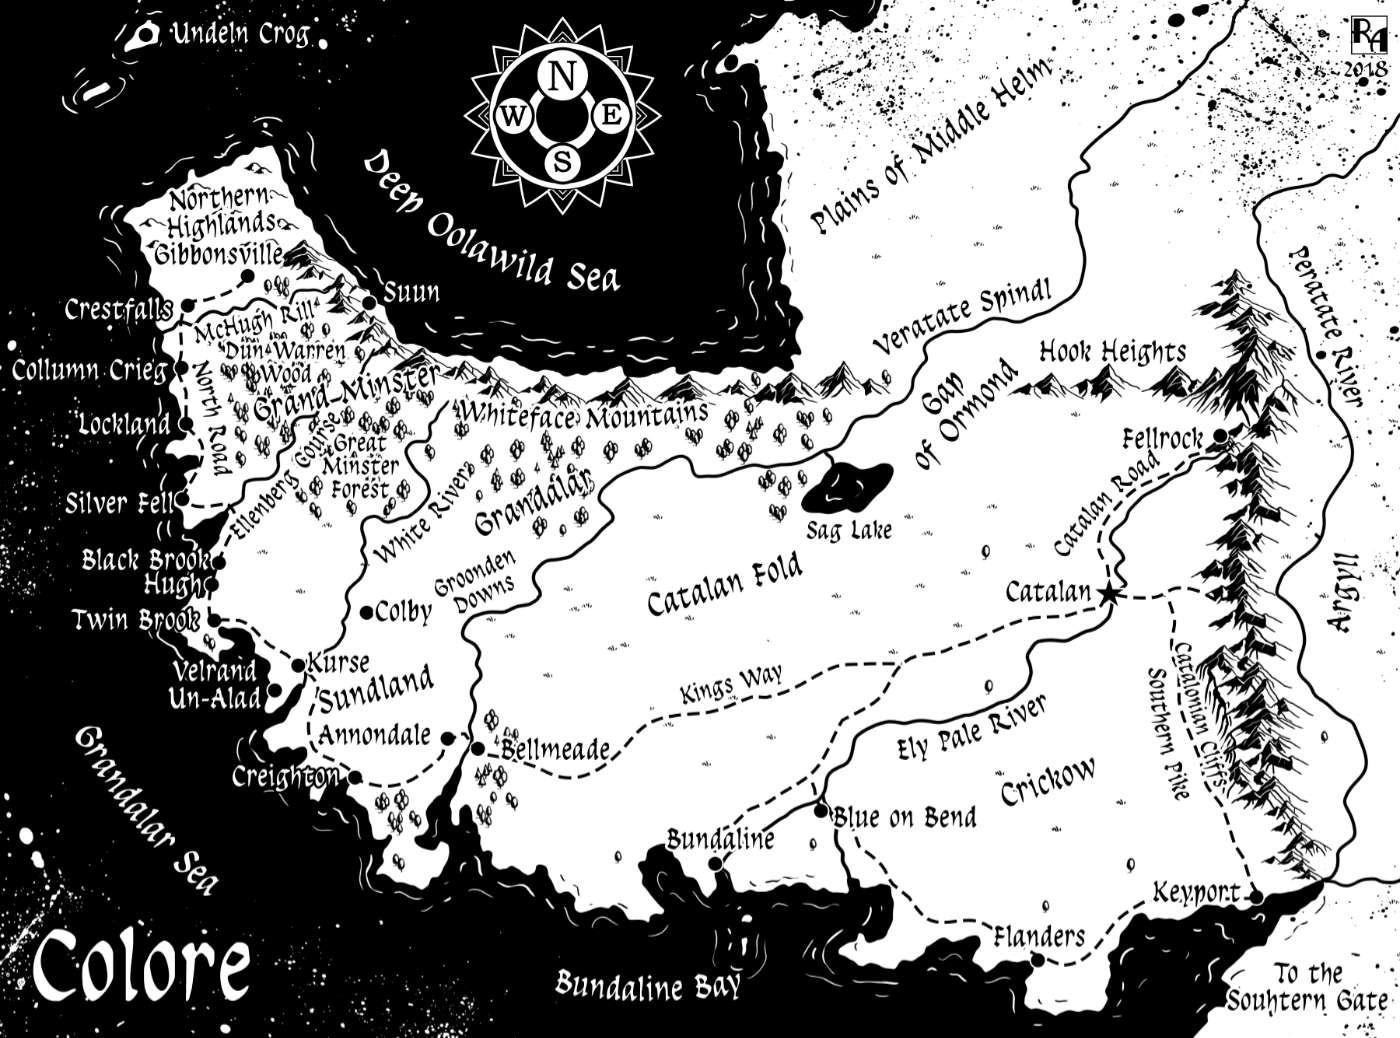 Robert altbauer colore fantasy map